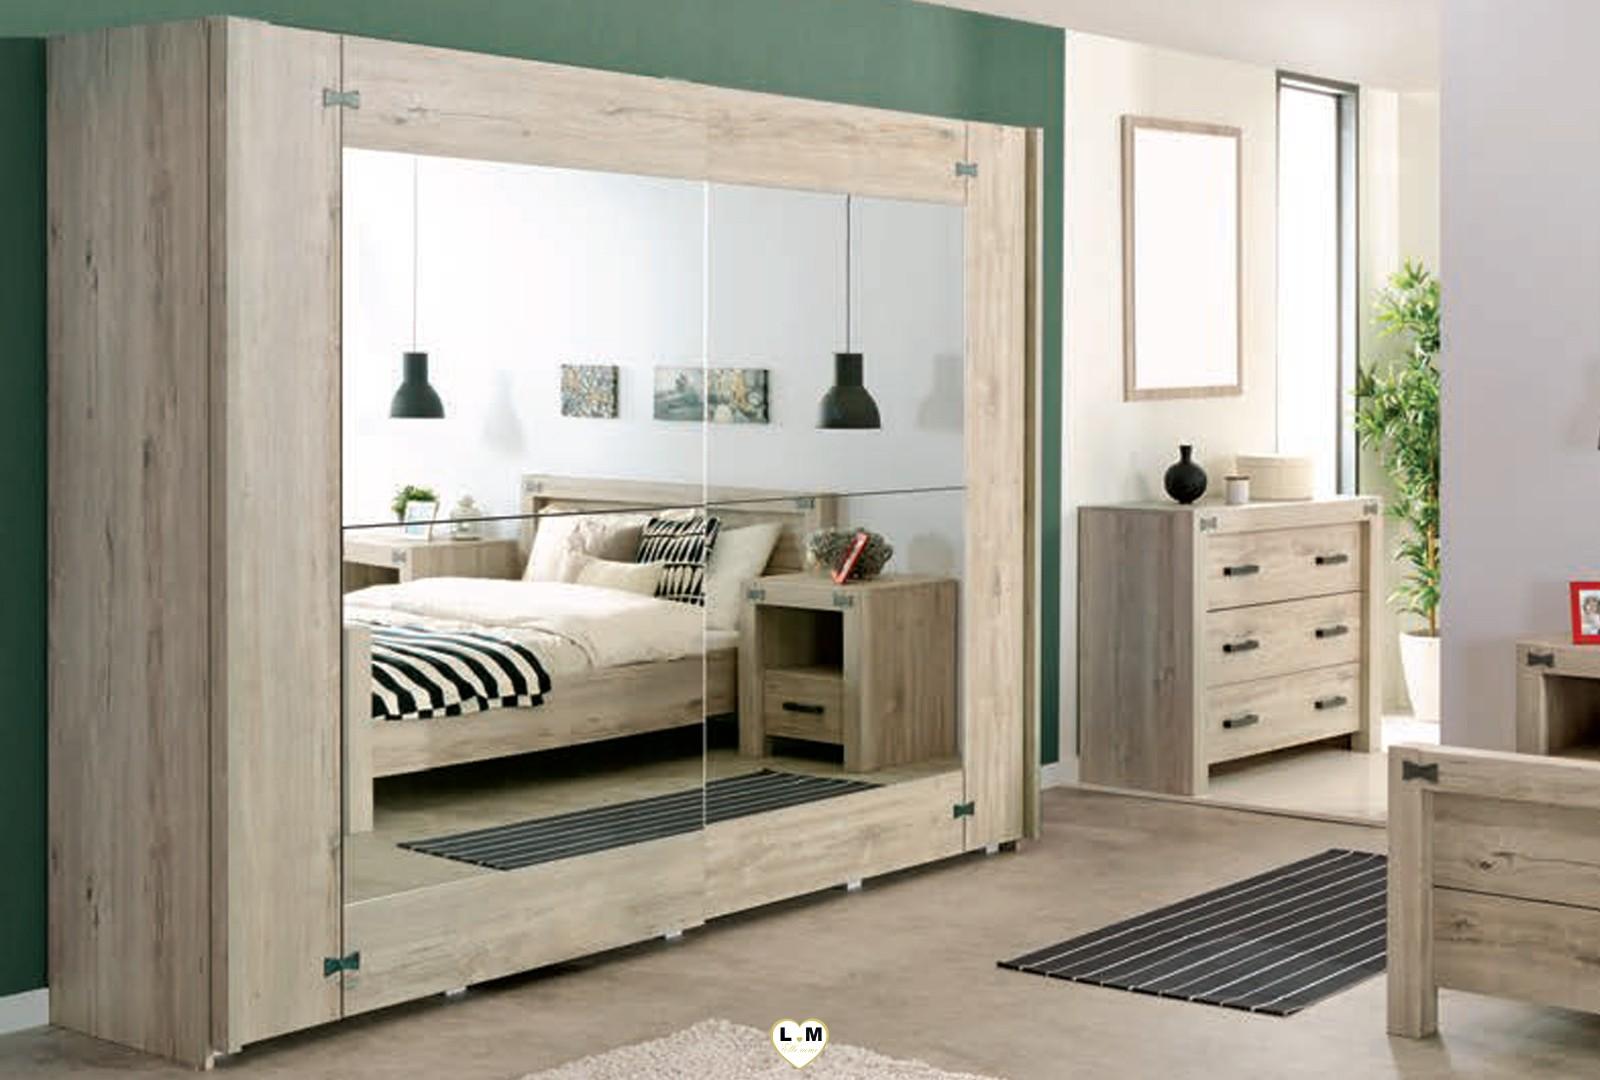 Maybeline bois chene gris clair ensemble chambre a coucher for Chambre a coucher ensemble